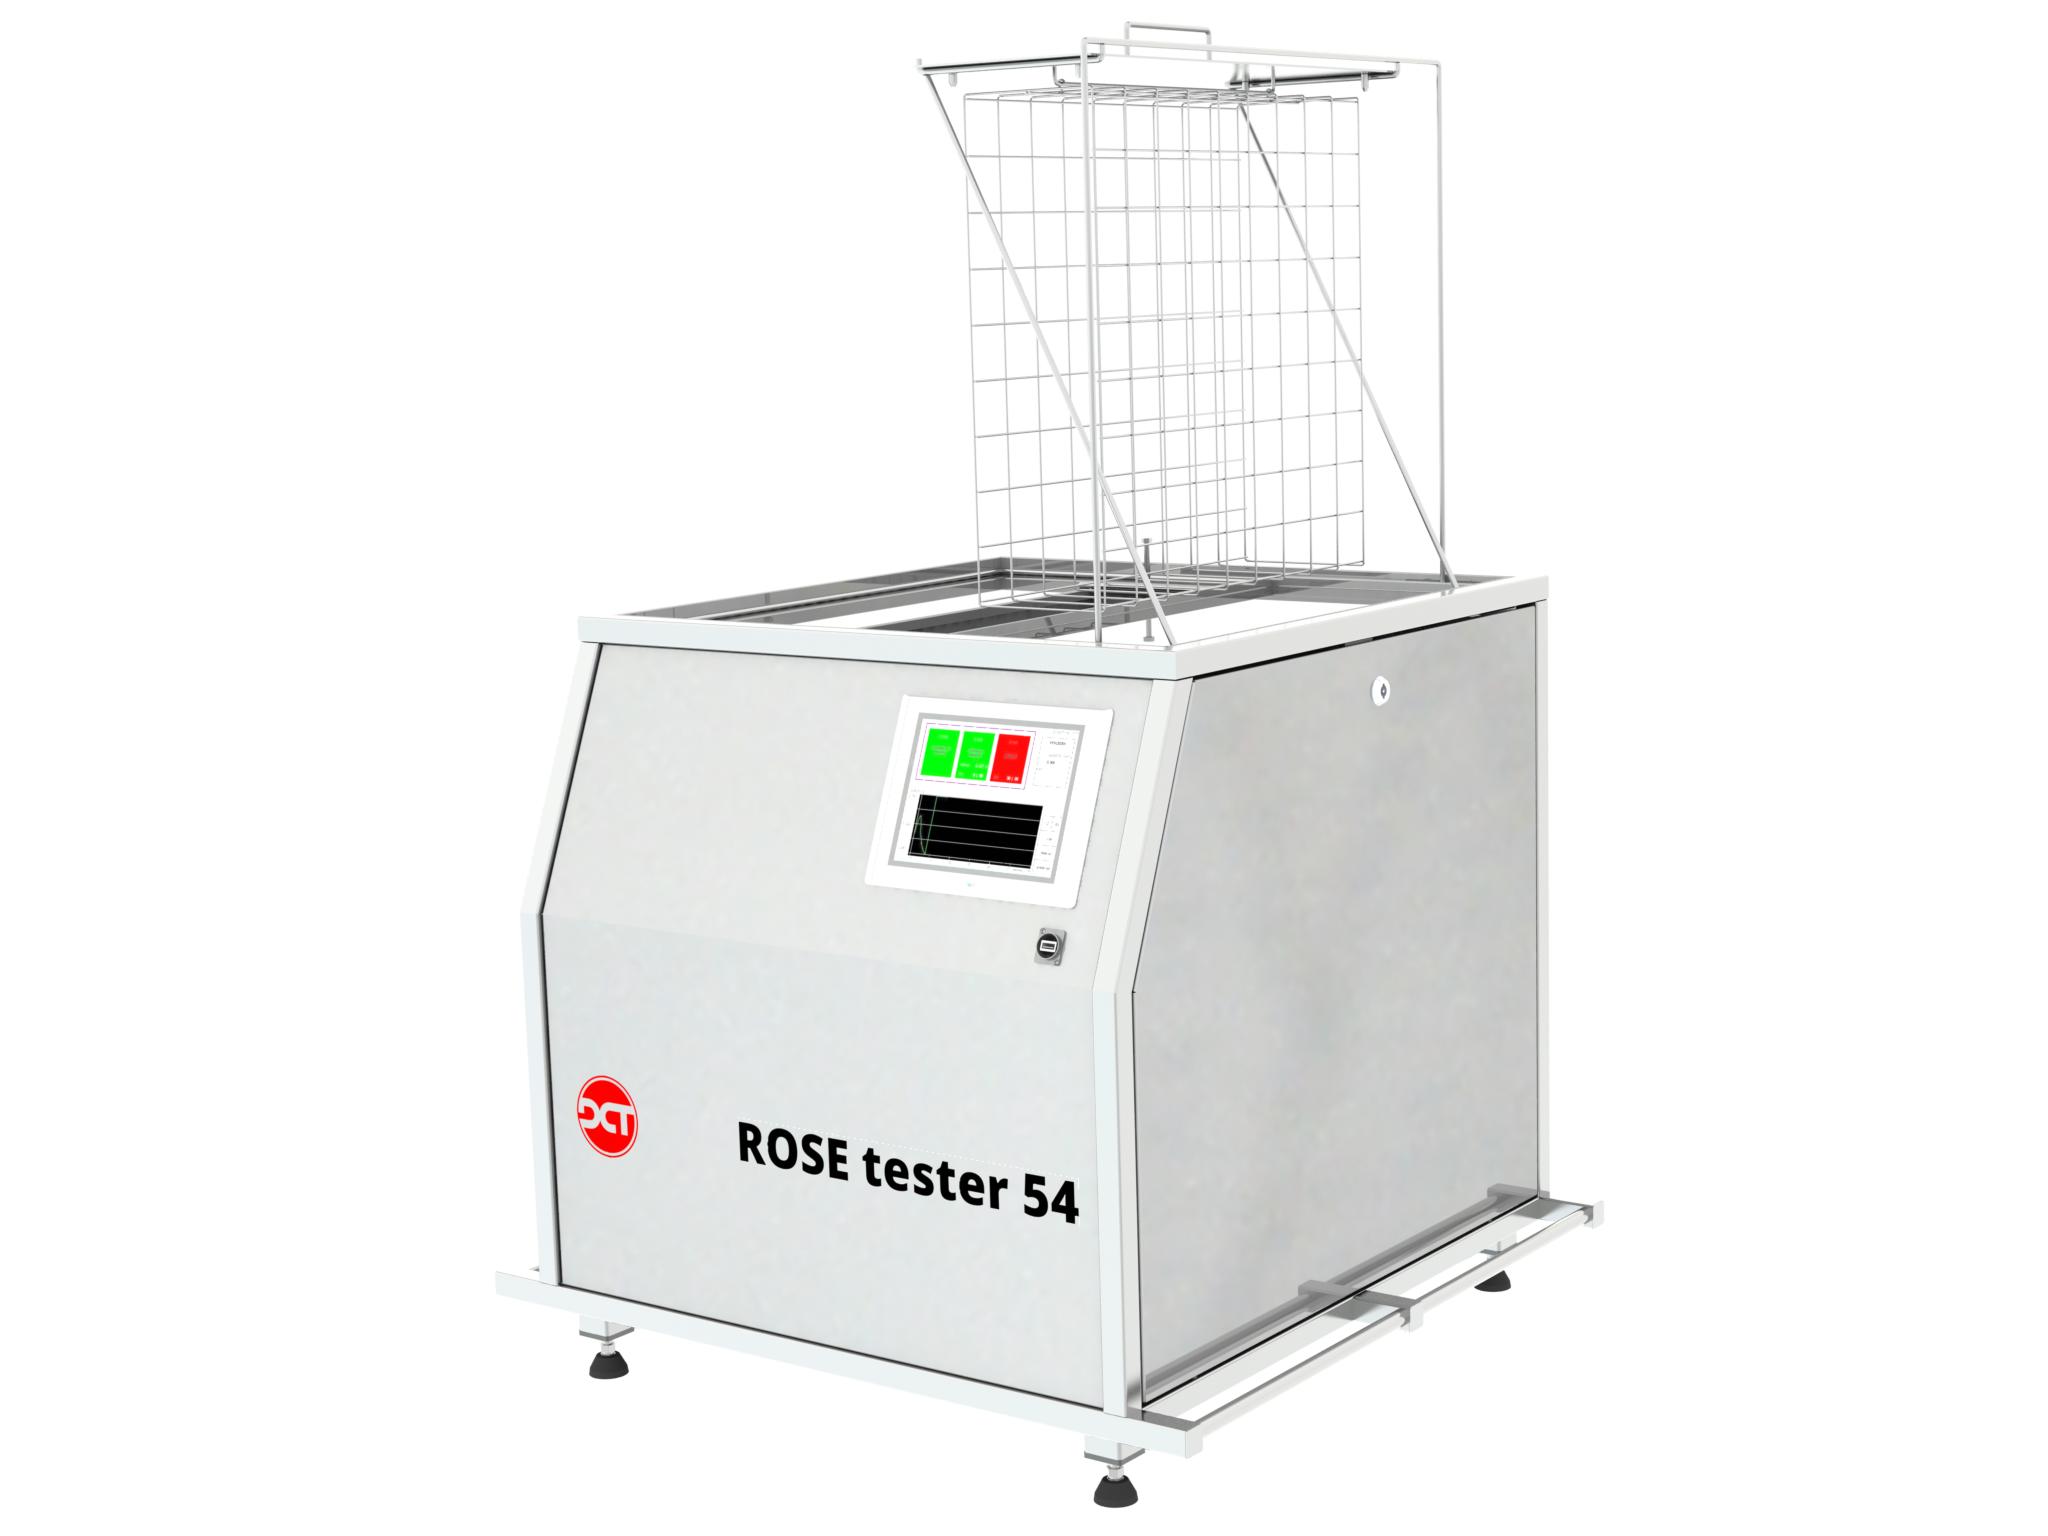 ROSE tester 54